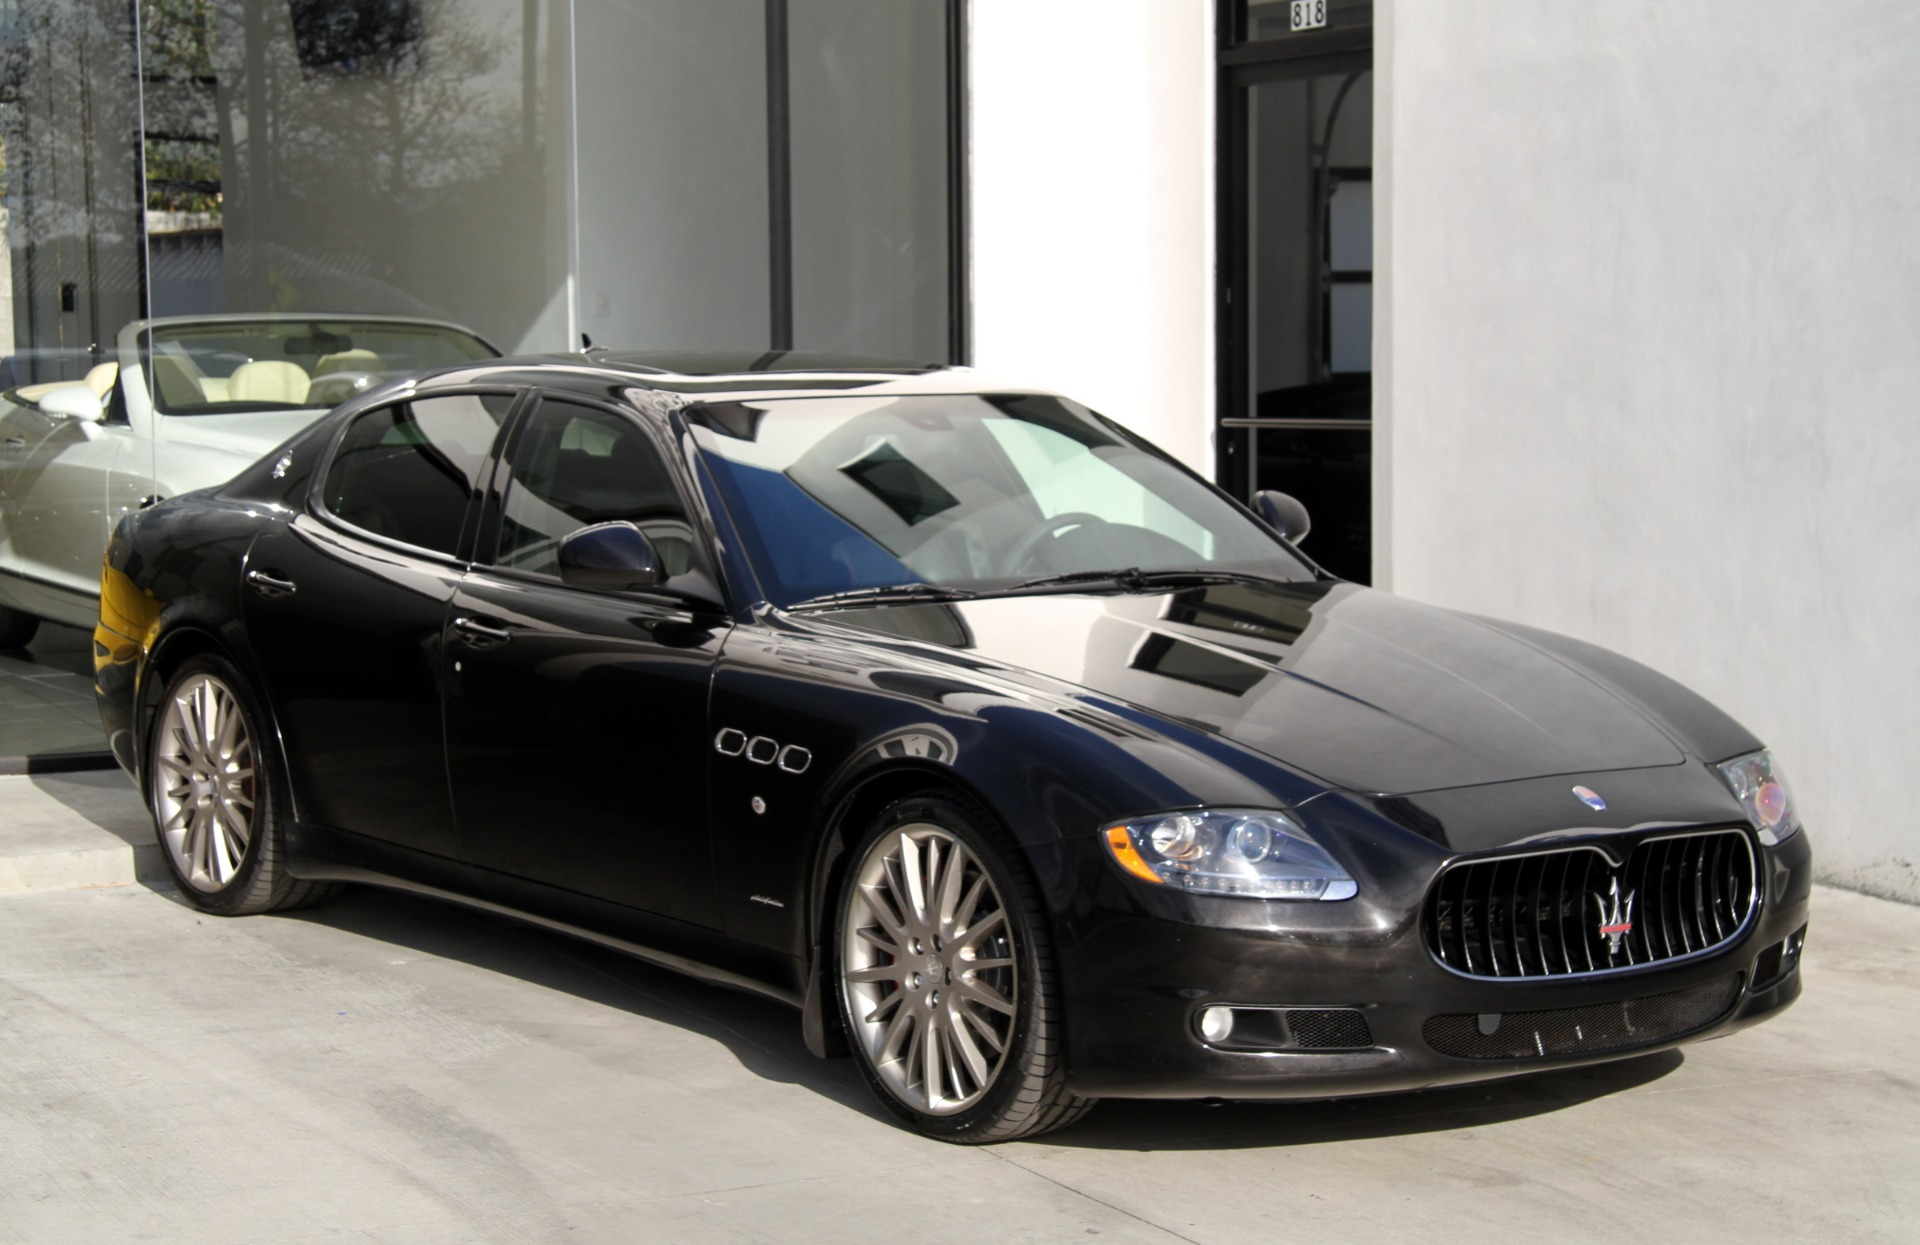 Custom Wheels Near Me >> 2009 Maserati Quattroporte SPORT GTS ** MSRP $146,850 ...